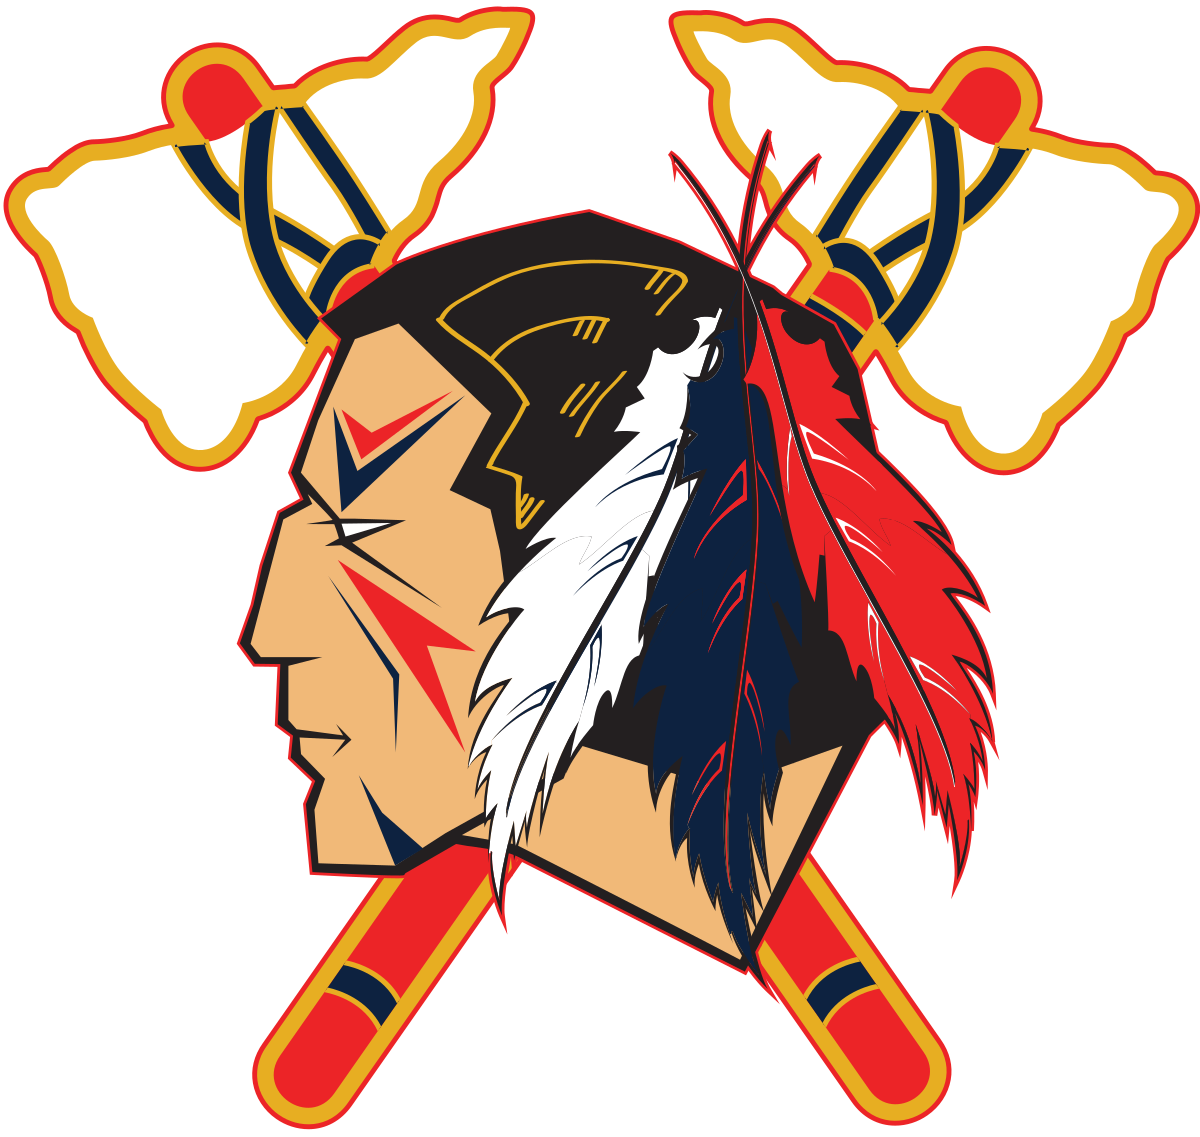 Johnstown tomahawks wikipedia . Warrior clipart tomahawk